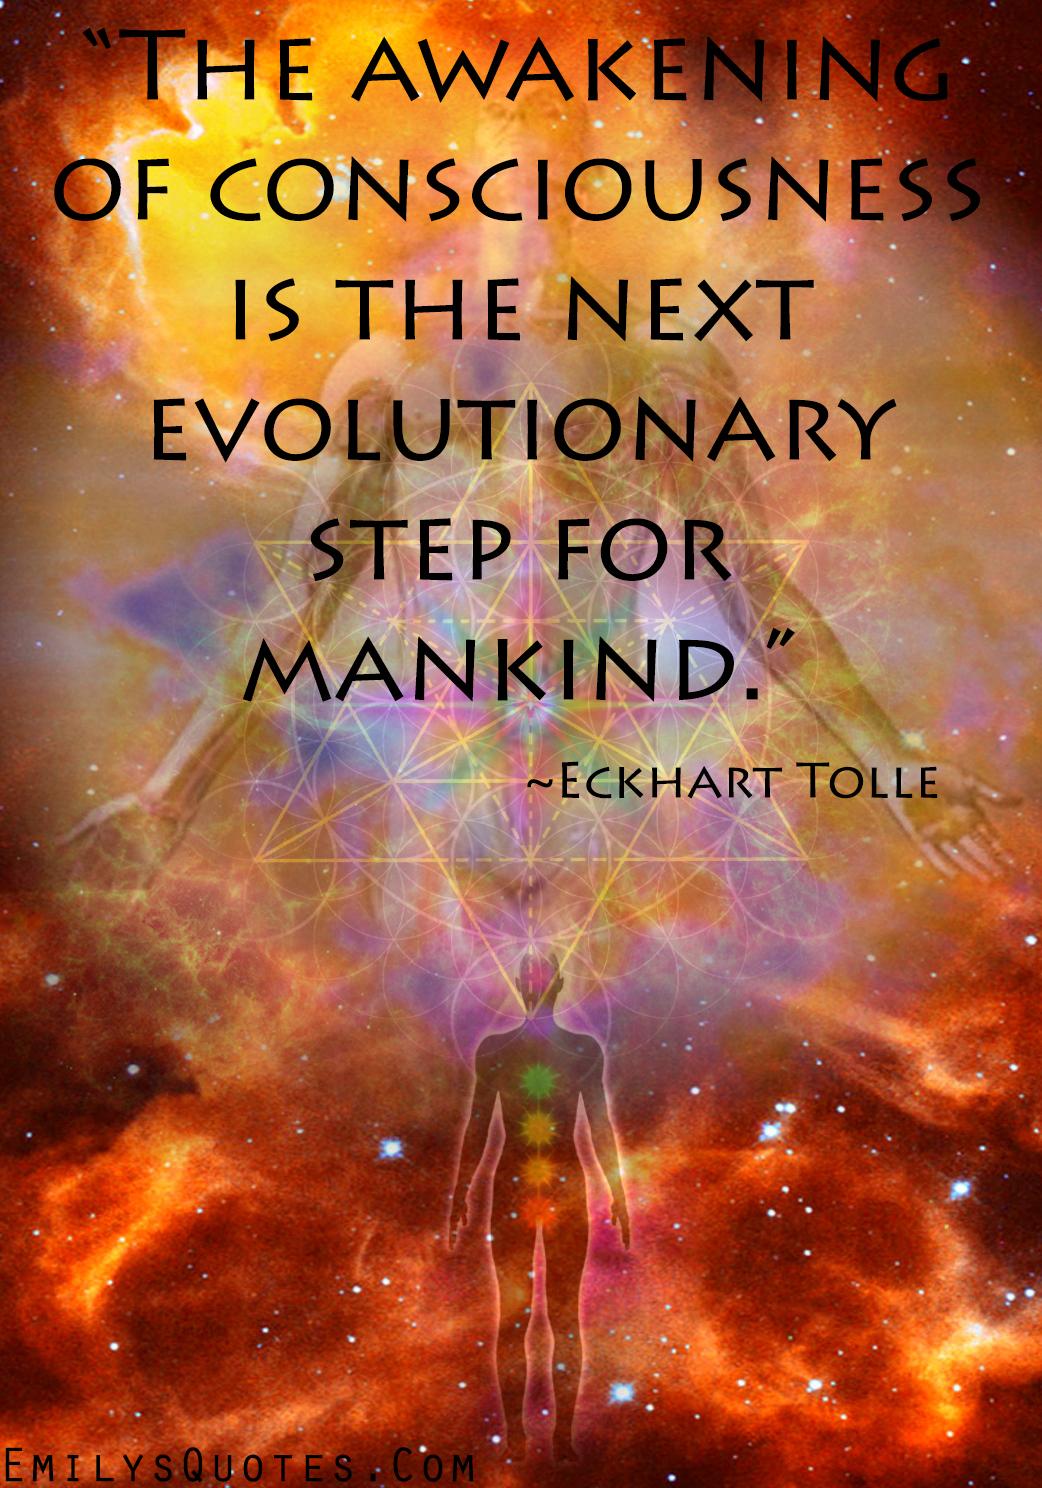 EmilysQuotes.Com - wisdom, amazing, great, Eckhart Tolle, awakening, evolution, life, future, consciousness